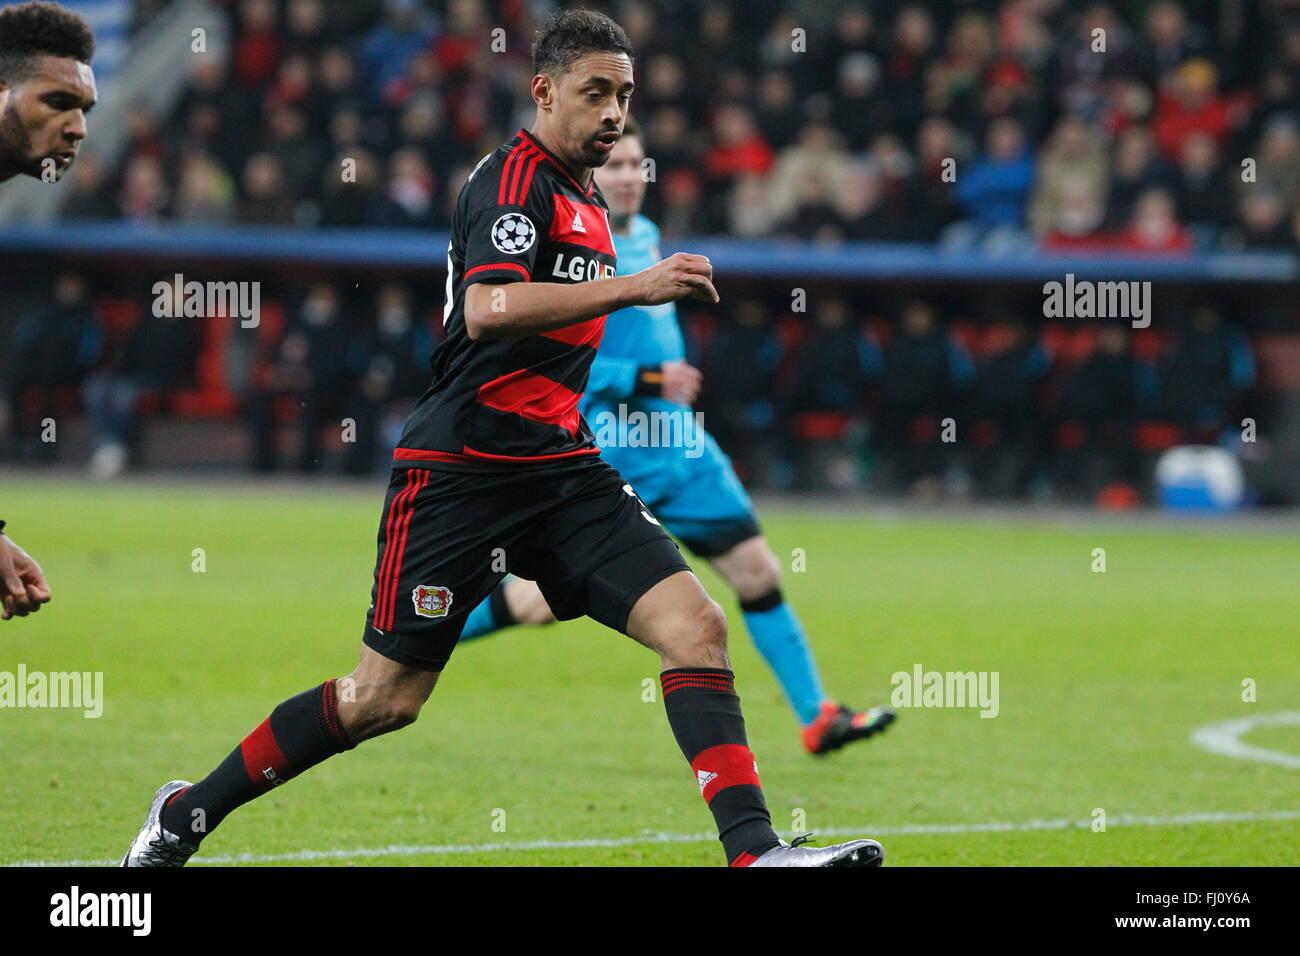 Karim Bellarabi during the champion league match Bayer Leverkusen - FC Barcelona December 9, 2015 in the Bay Arena - Stock Image